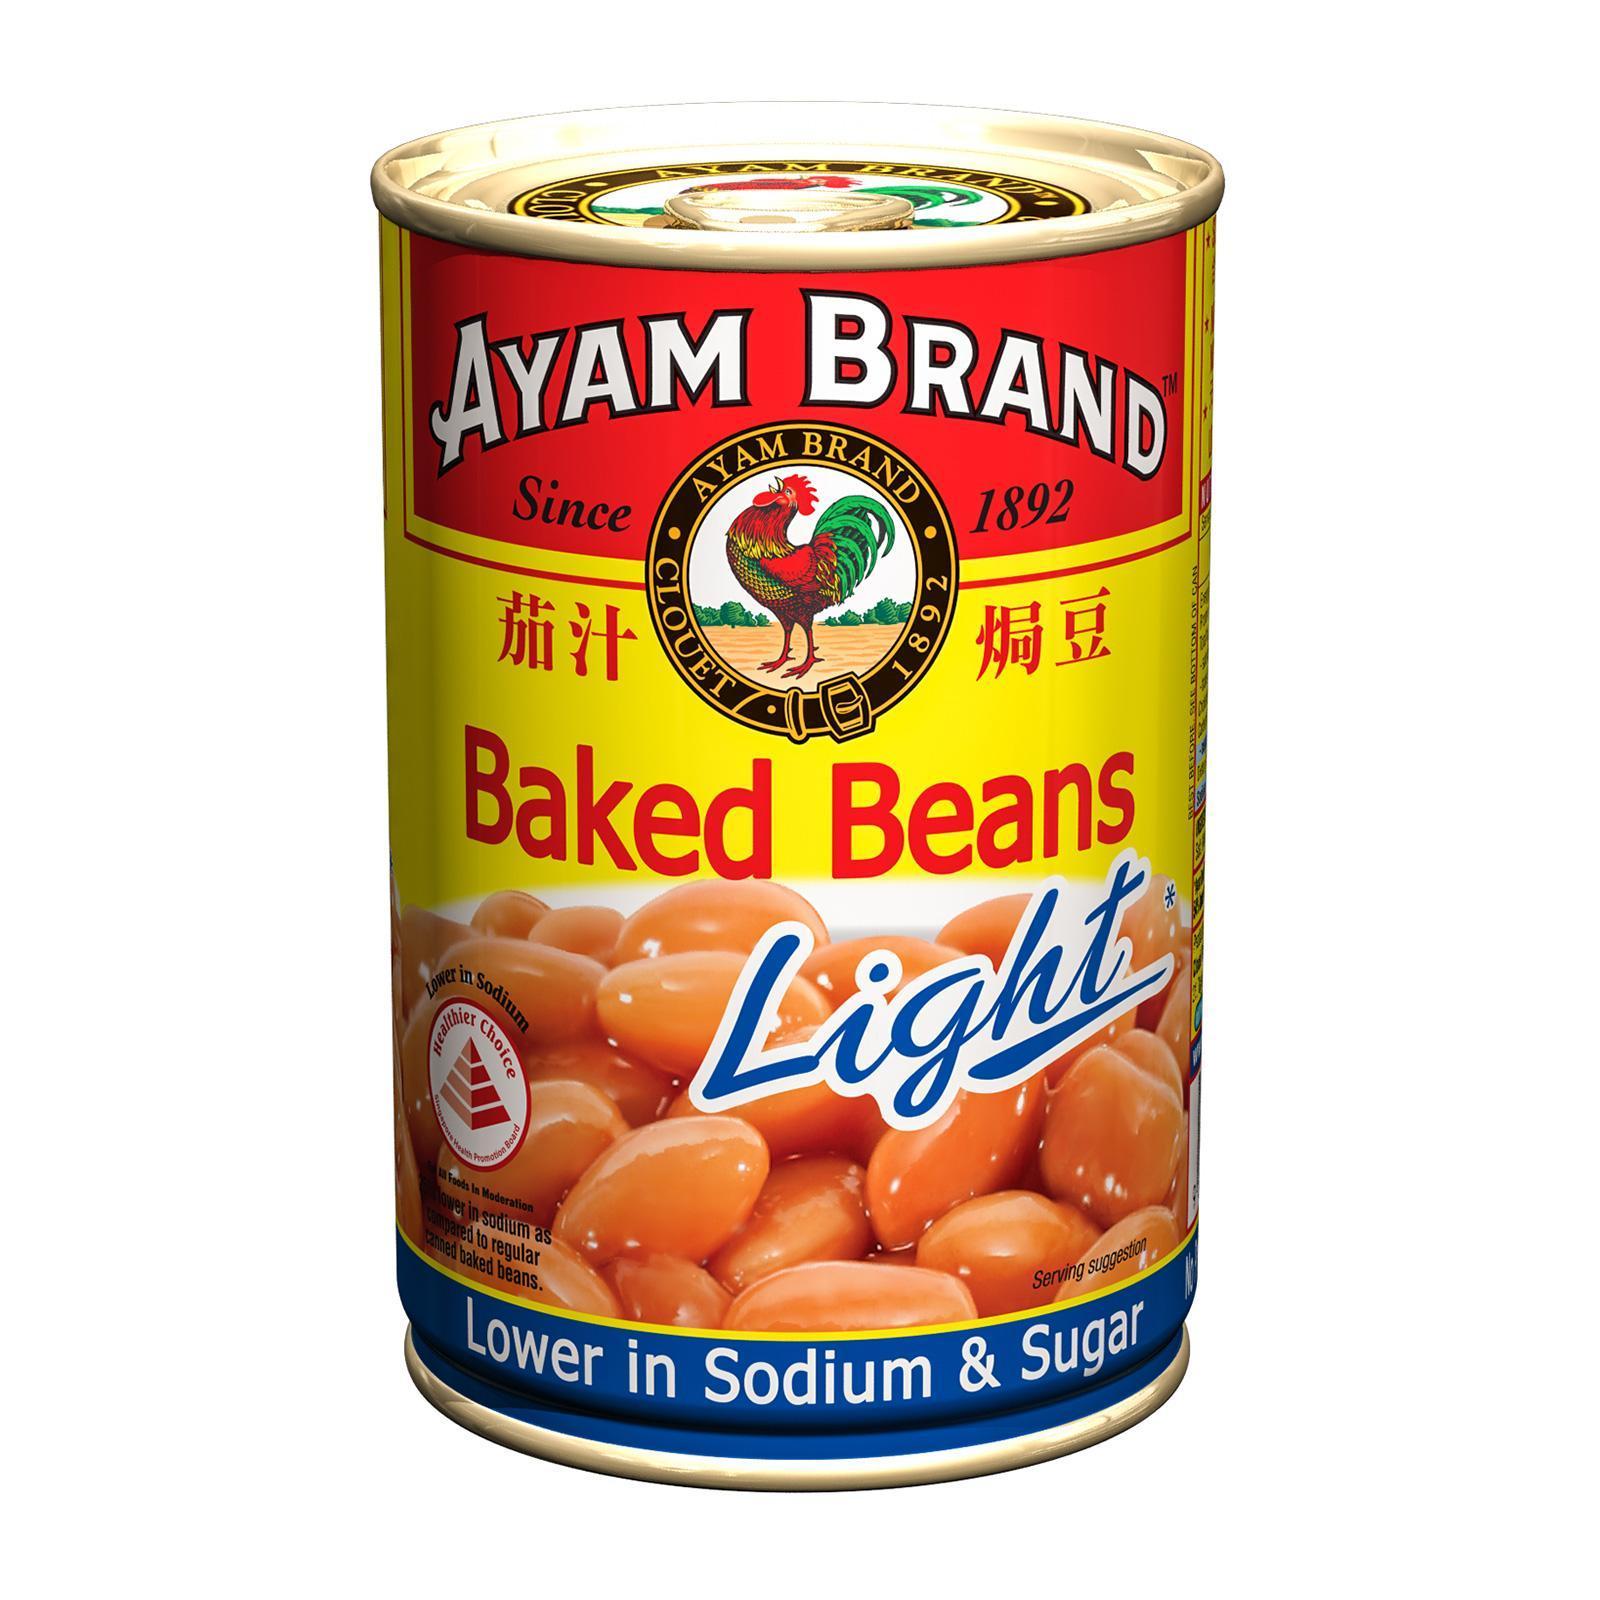 Ayam Brand Baked Beans in Tomato Sauce Light